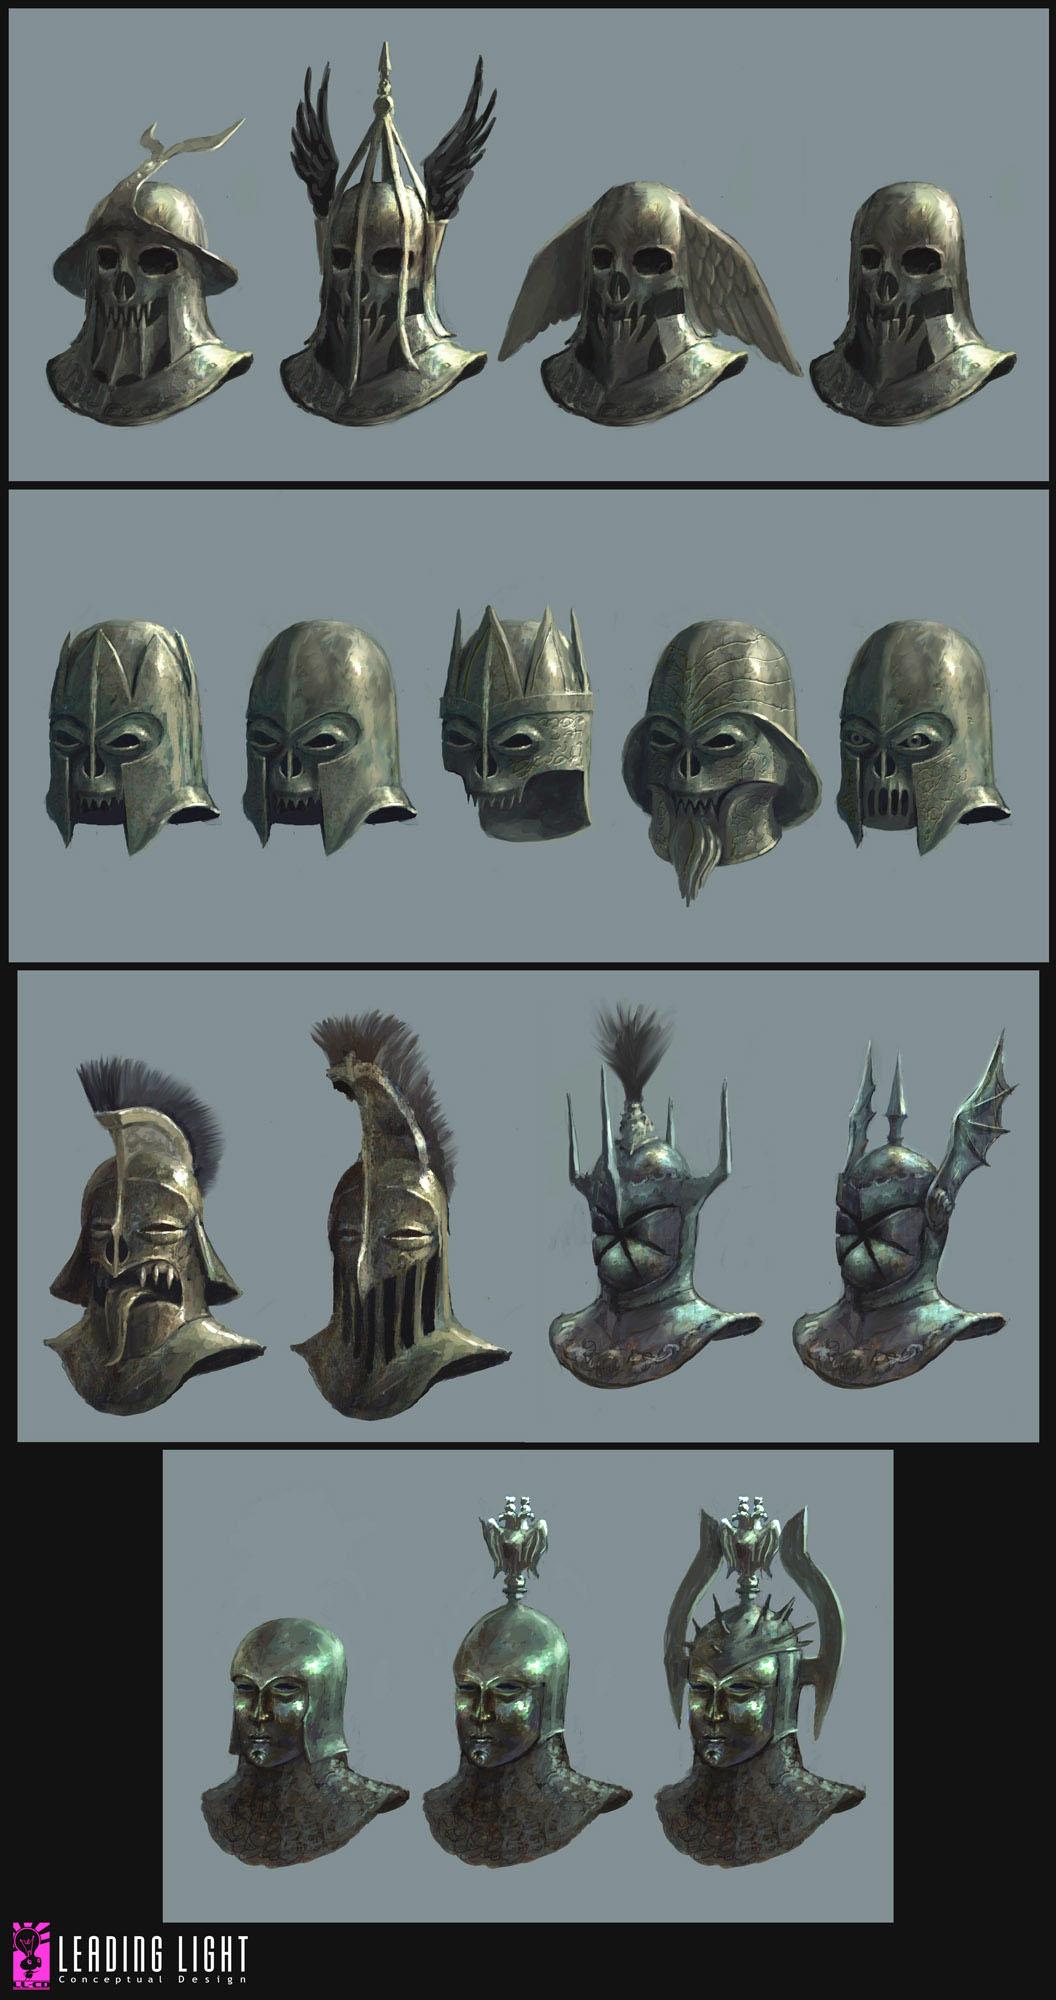 Fable II helmet designs by PeteAmachree on DeviantArt